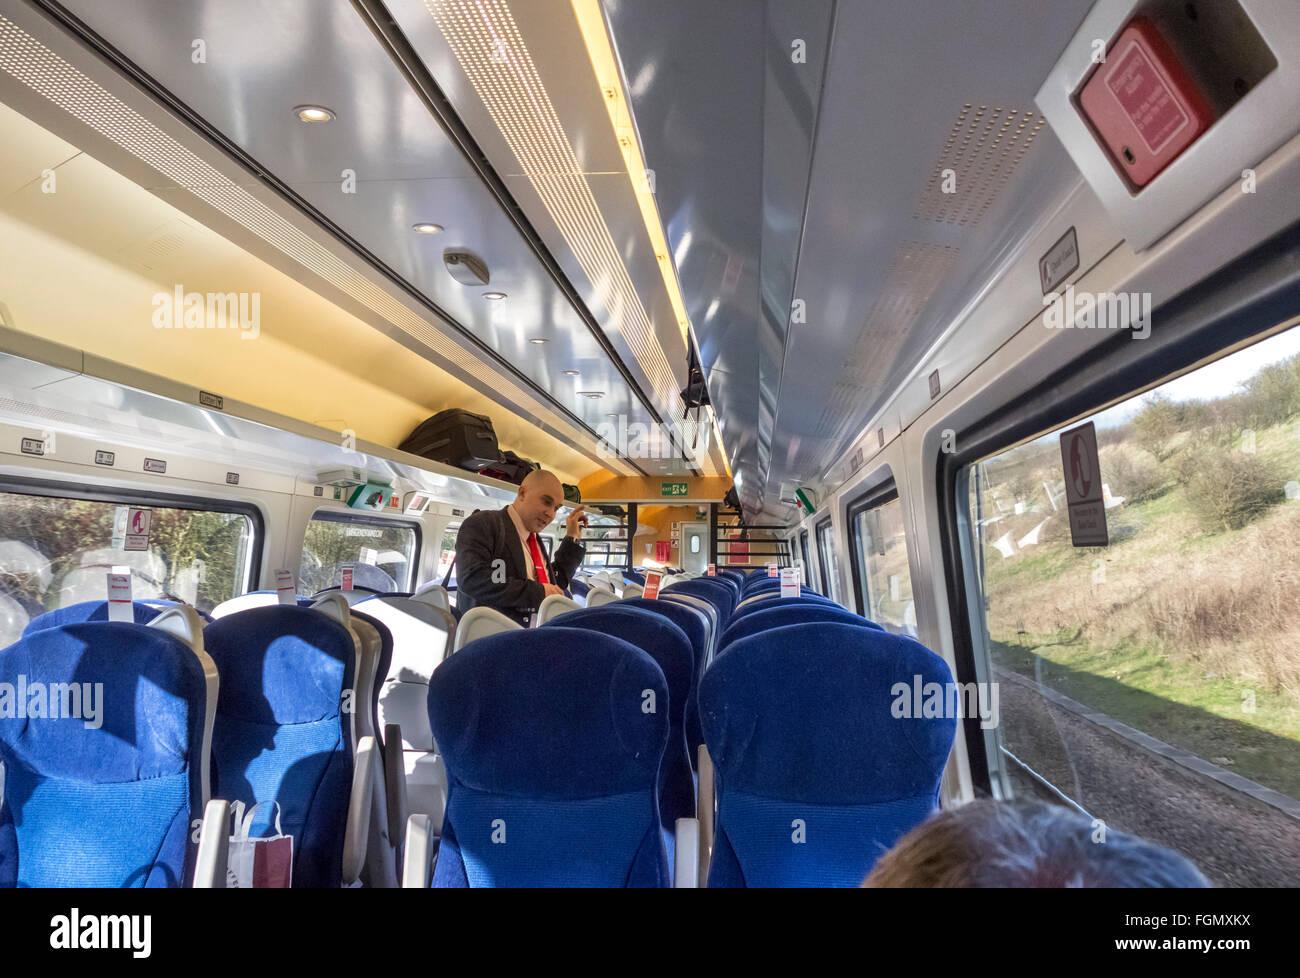 Ticket inspector on Virgin Trains East Coast line between London and Leeds, UK - Stock Image